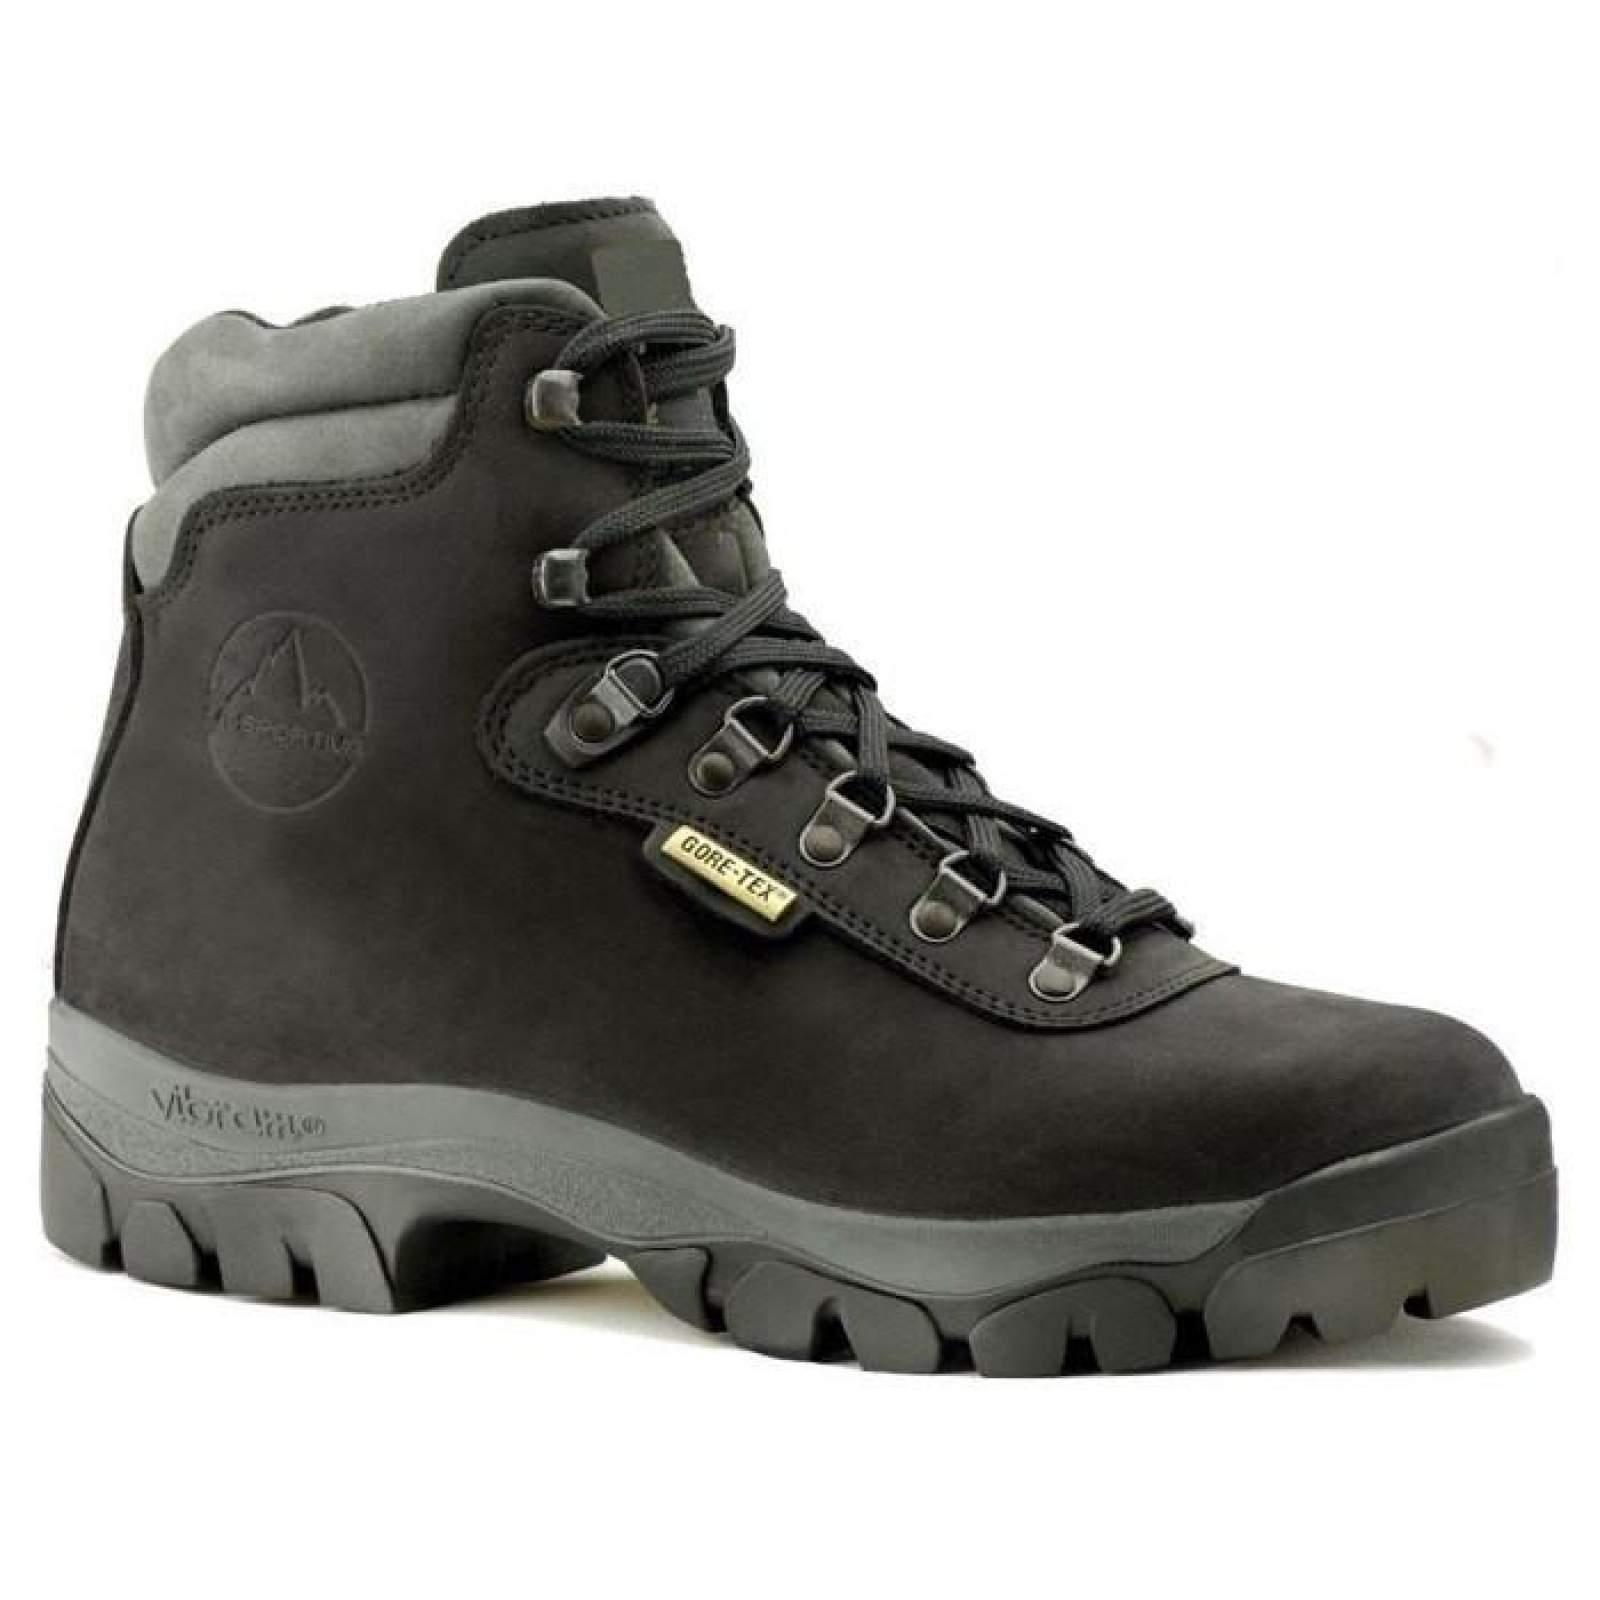 72e2f6ca La Sportiva Ботинки La Sportiva Tibet GTX муж. треккинговые – купить ...